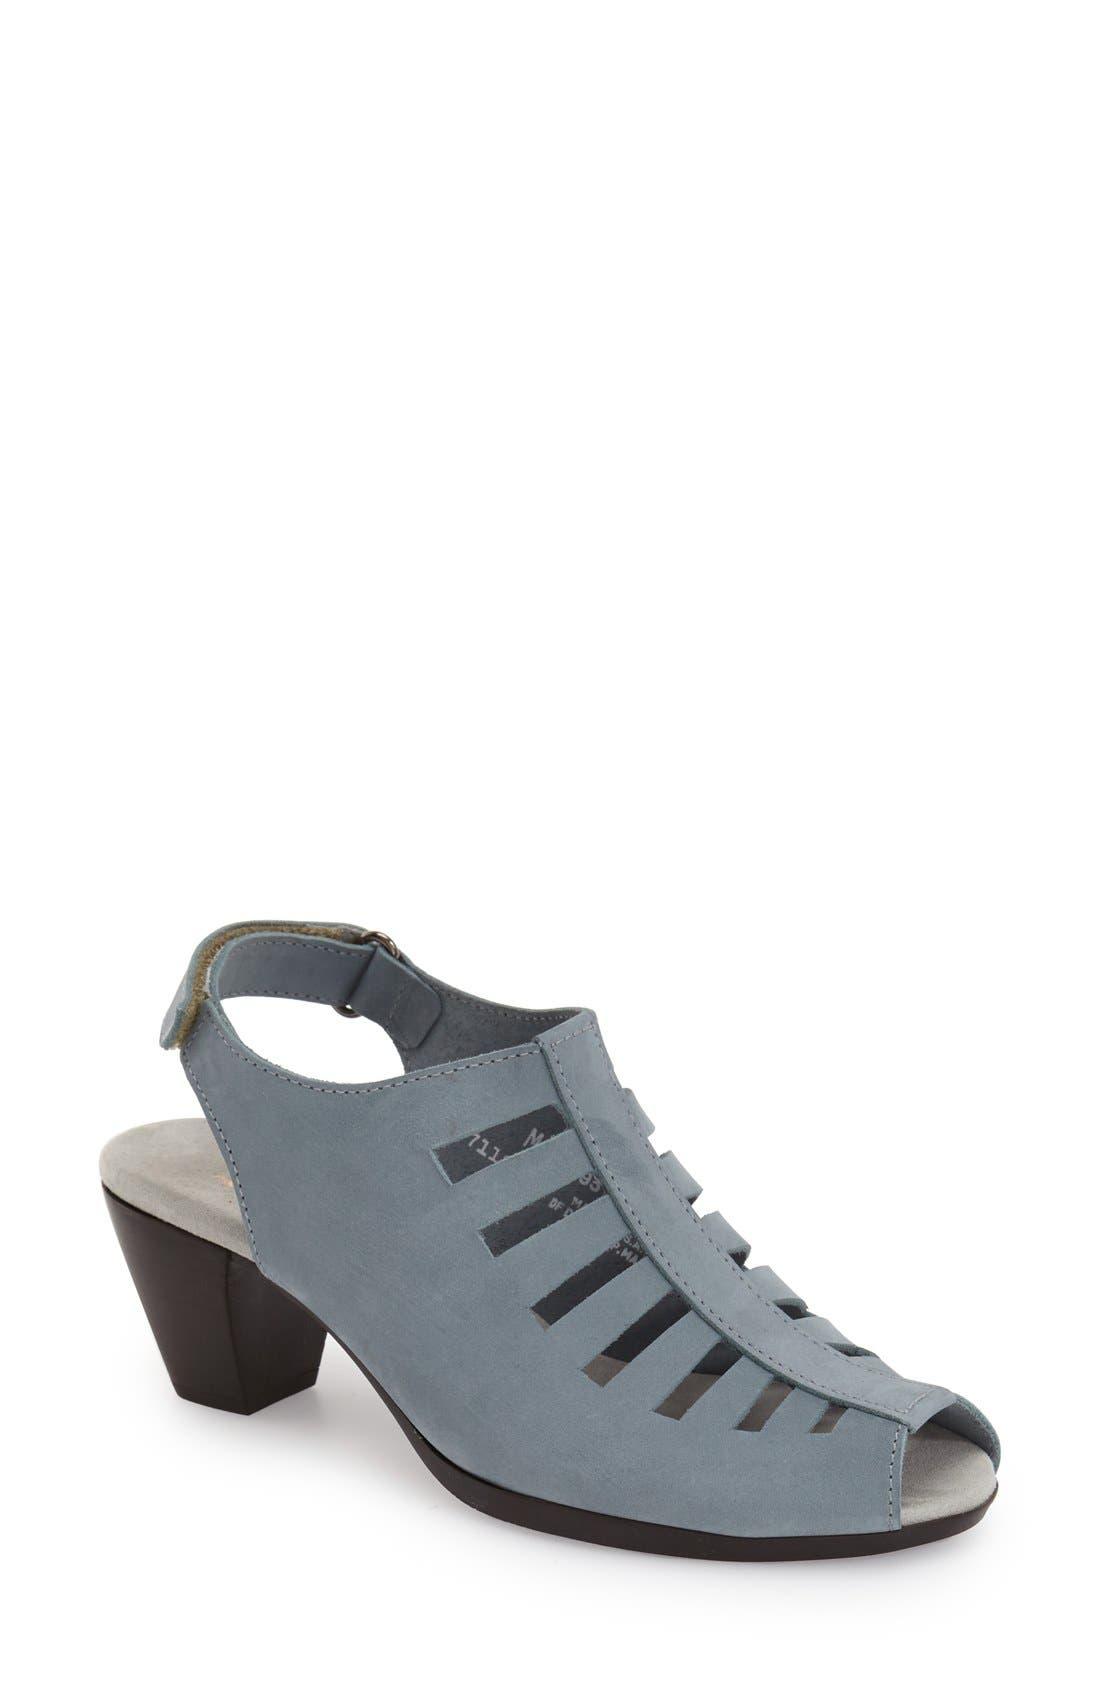 Main Image - Munro 'Abby' Slingback Sandal (Women)